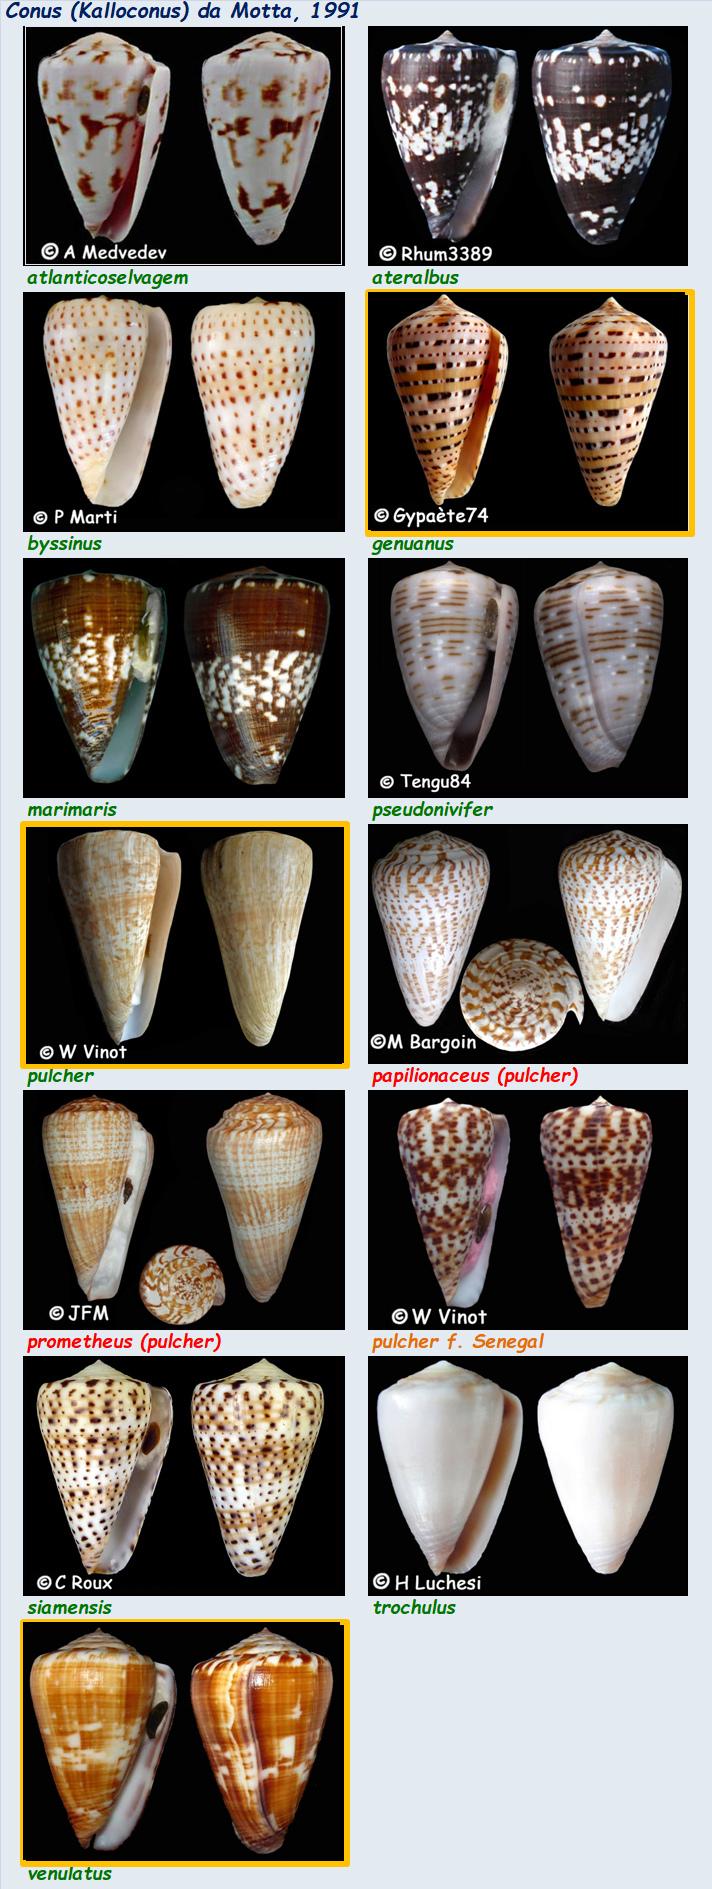 Conidae Conus (Kalloconus) - Le genre, ses espèces, la planche 03/03 Conus_51